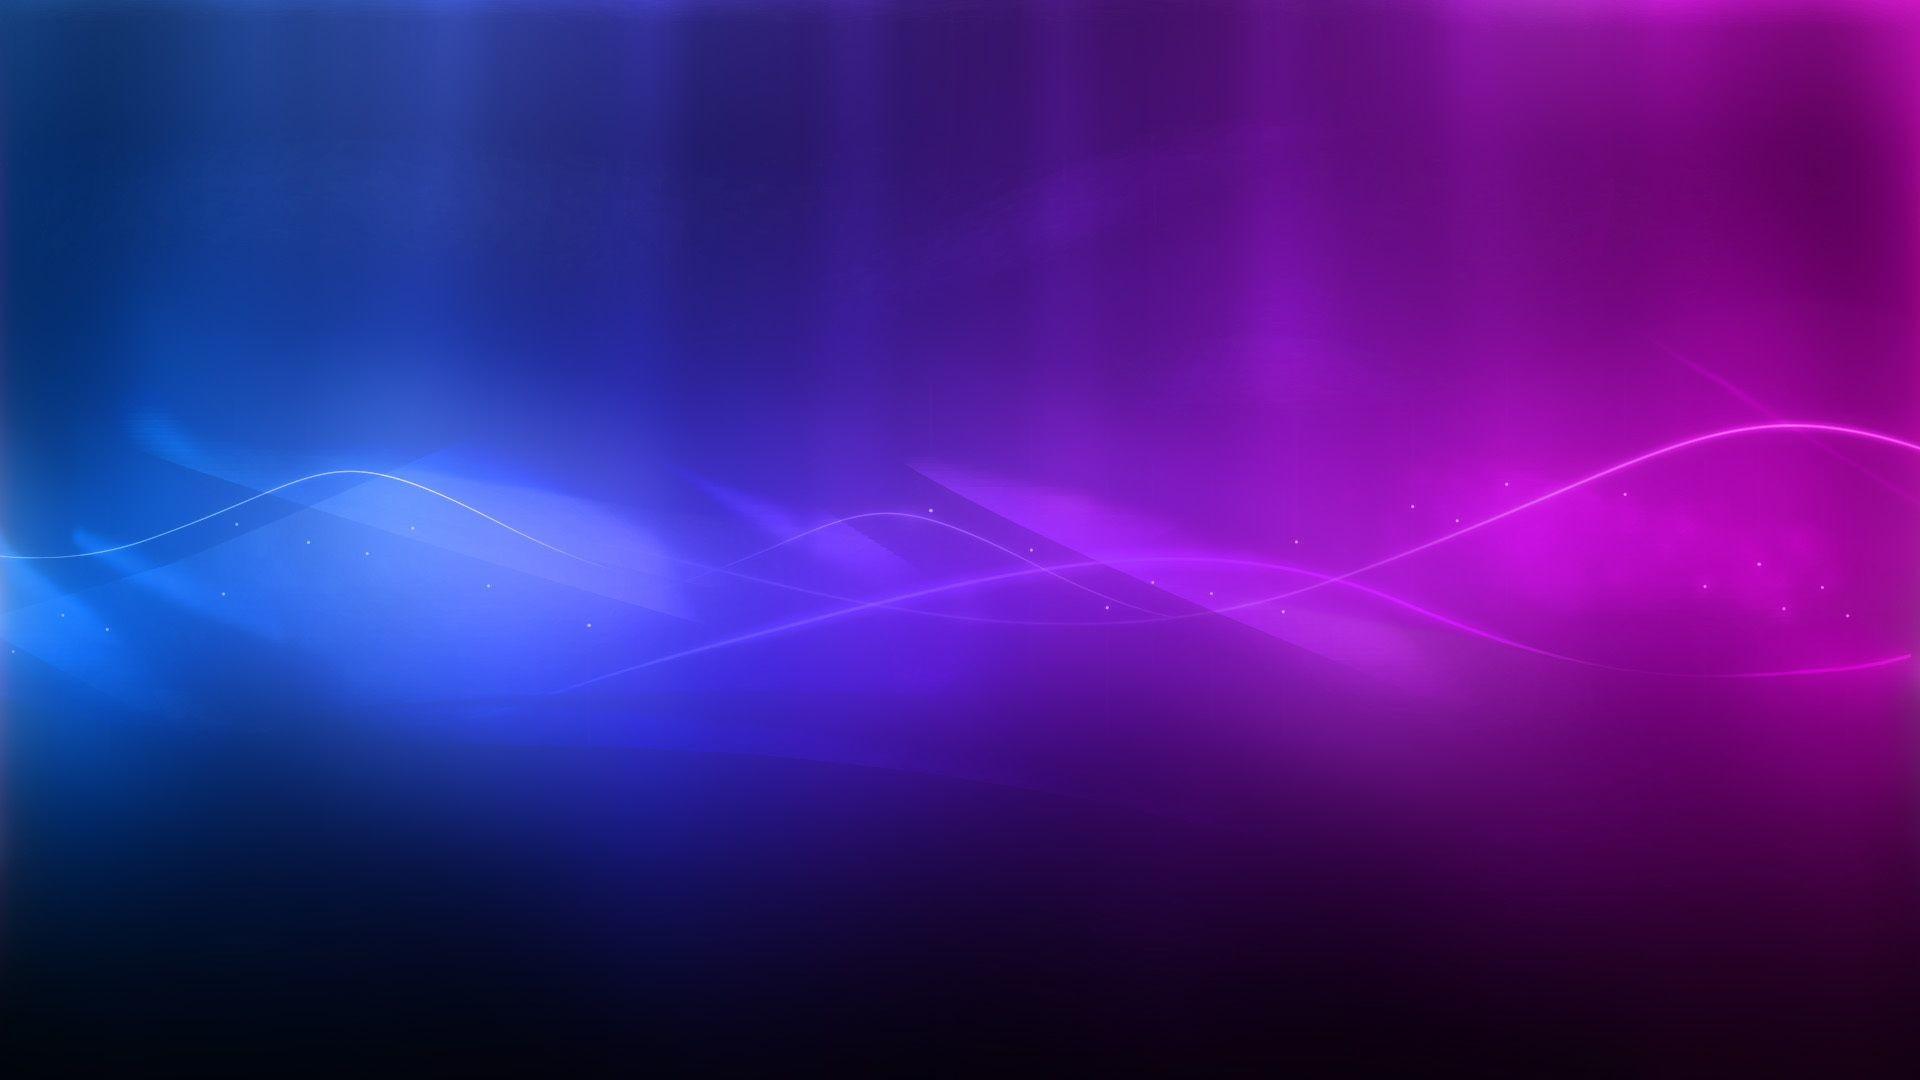 Purple Desktop Wallpaper 60 Images